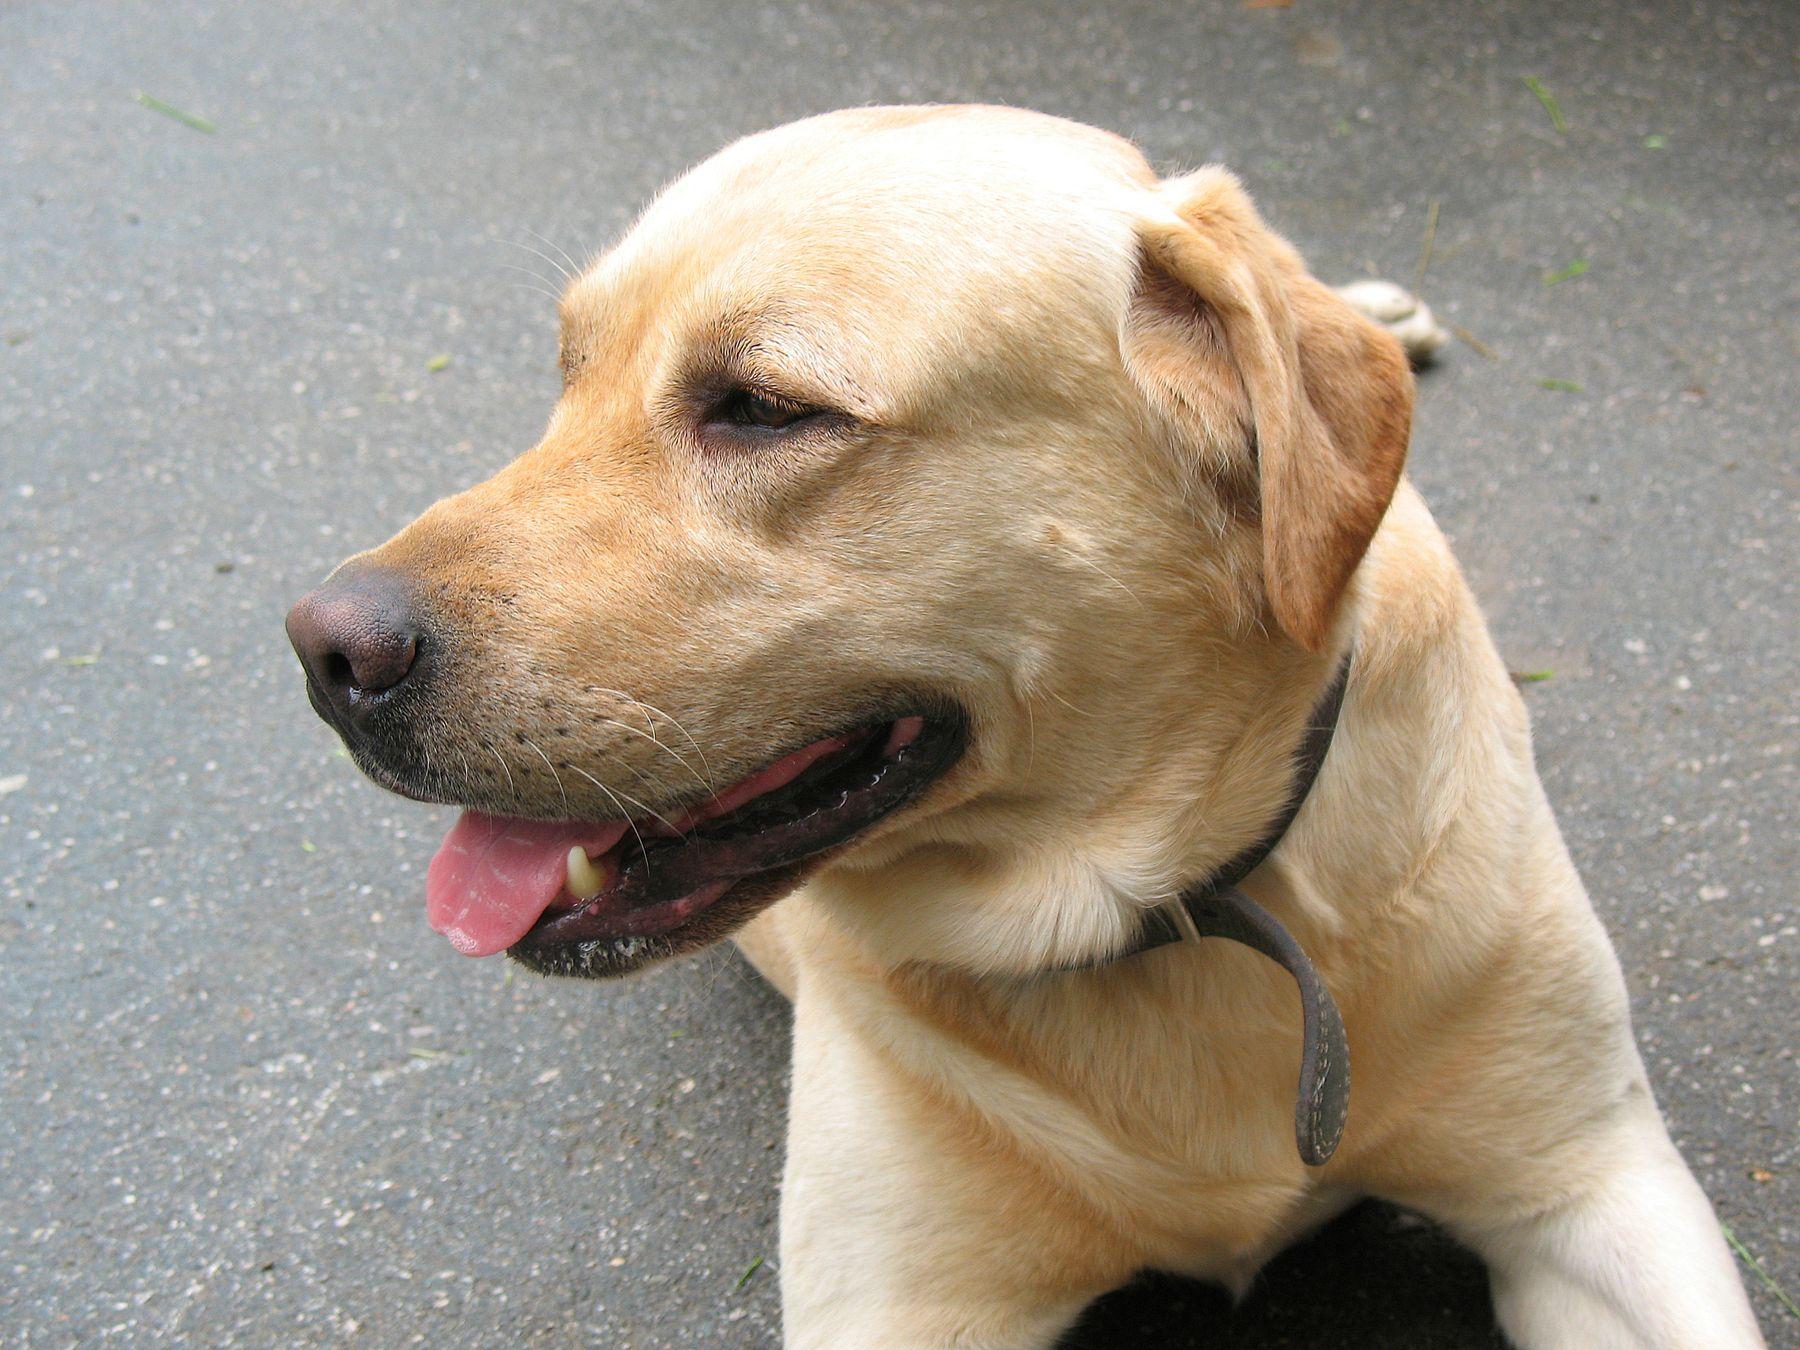 Лабрадор природа животные собаки лето город